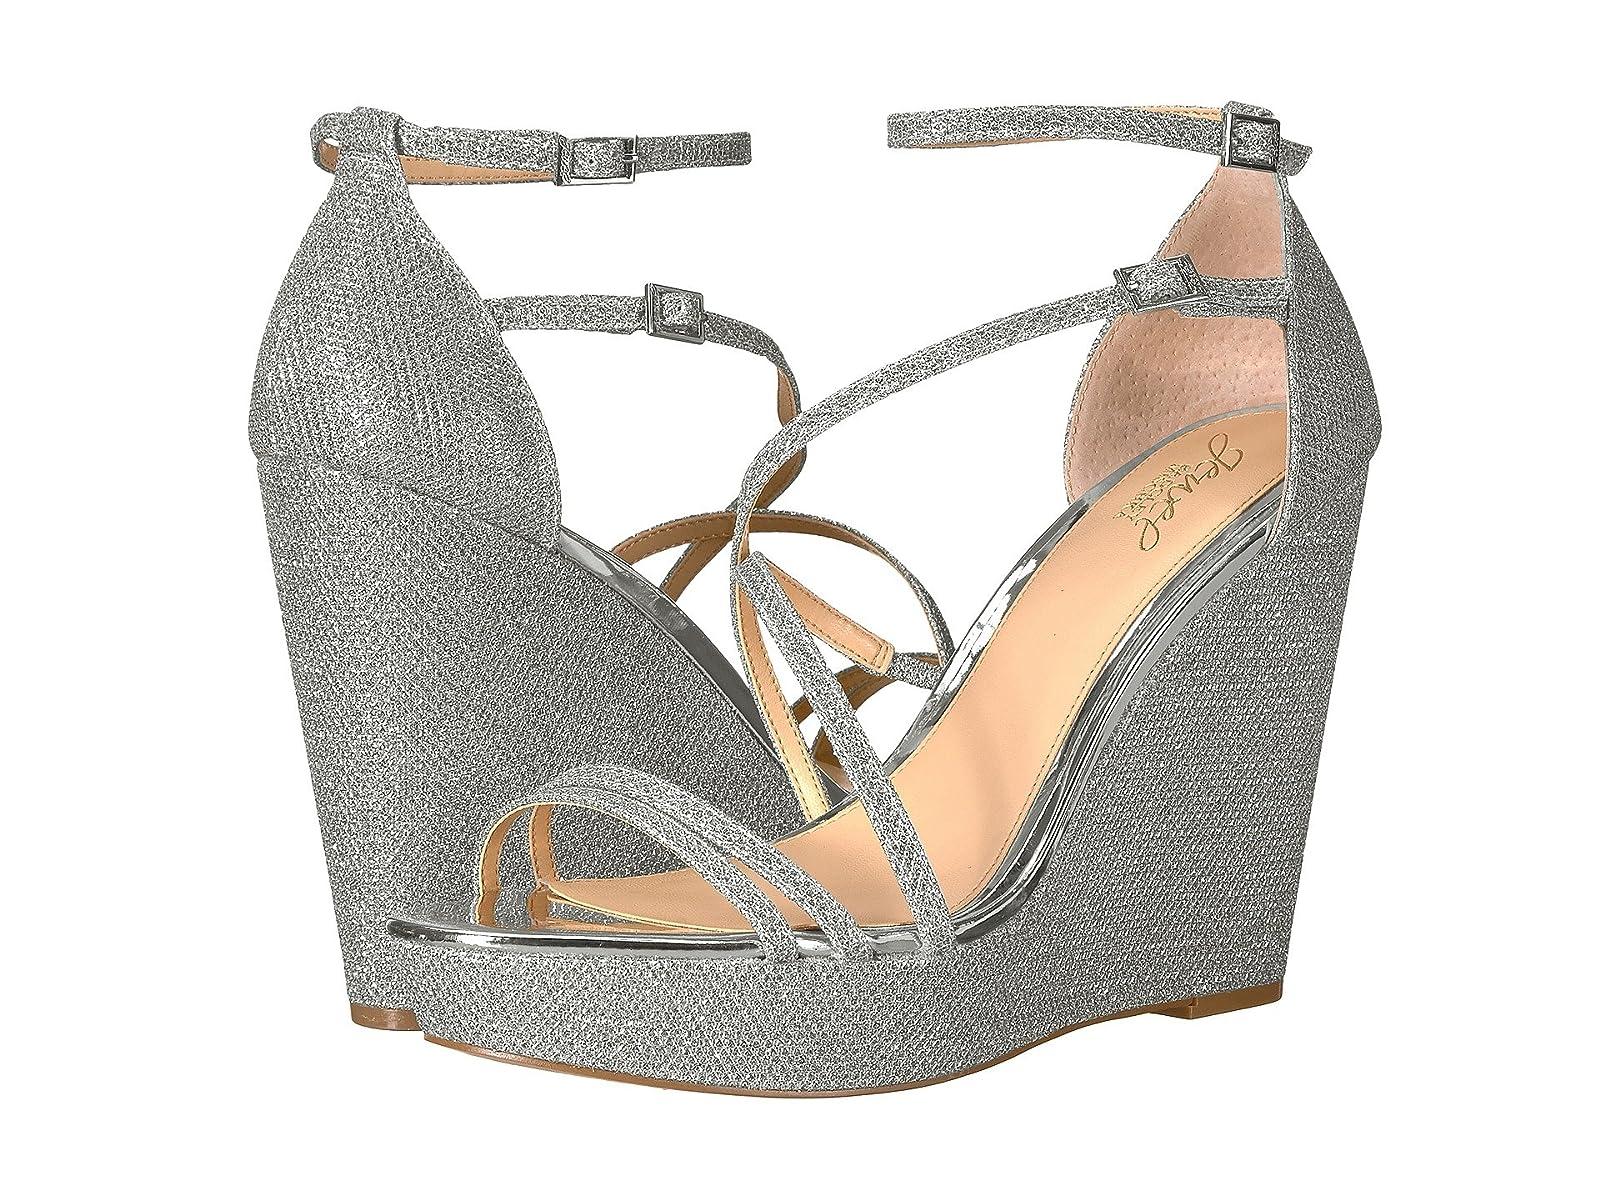 Jewel Badgley Mischka TatsuCheap and distinctive eye-catching shoes